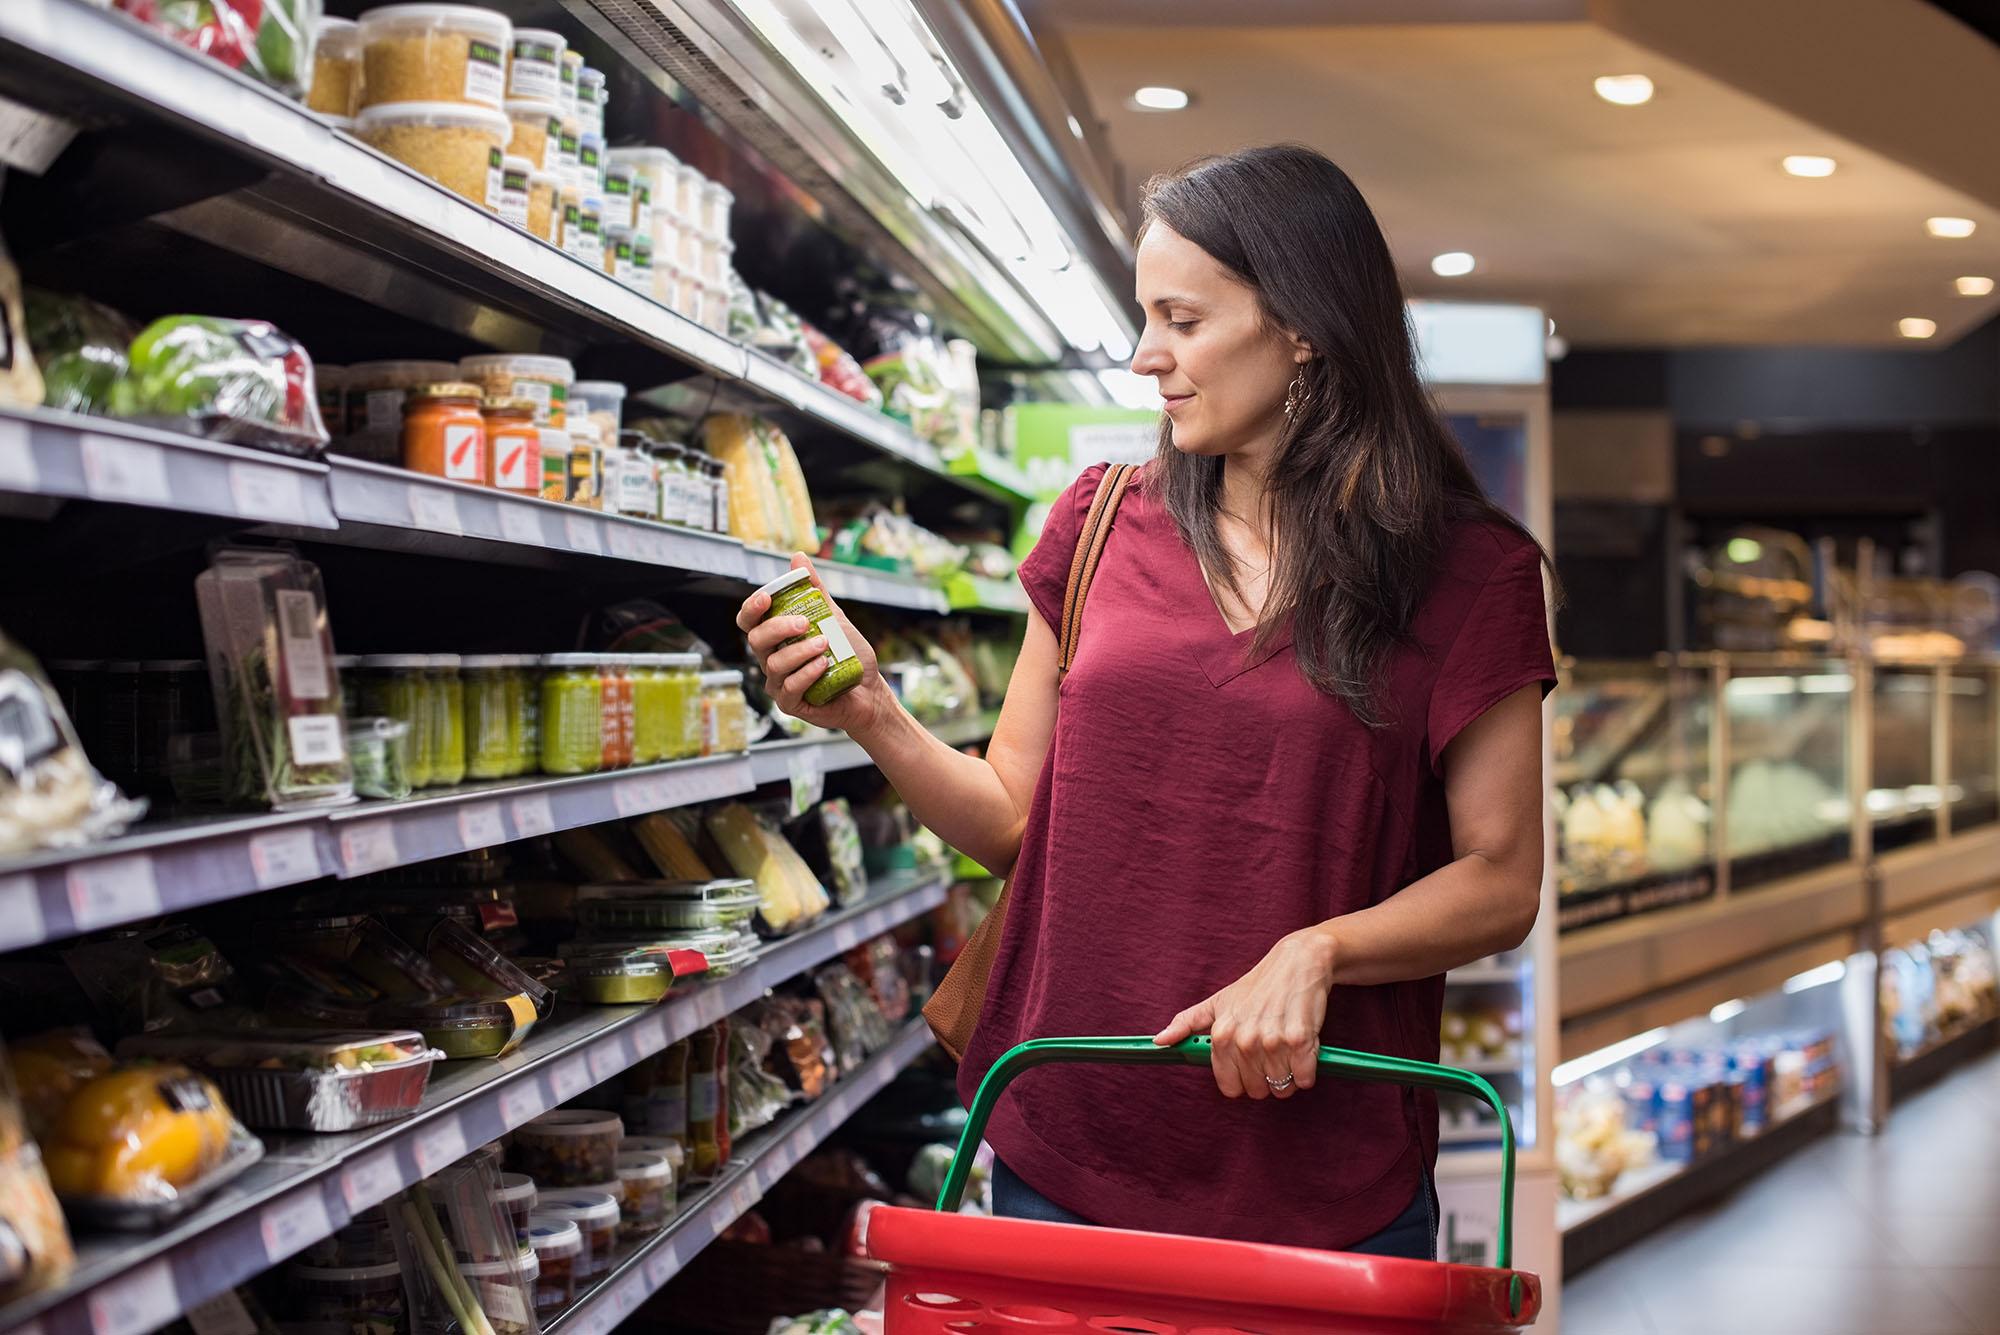 shop store supermarket personal injury accident claim compensation Aberdeen